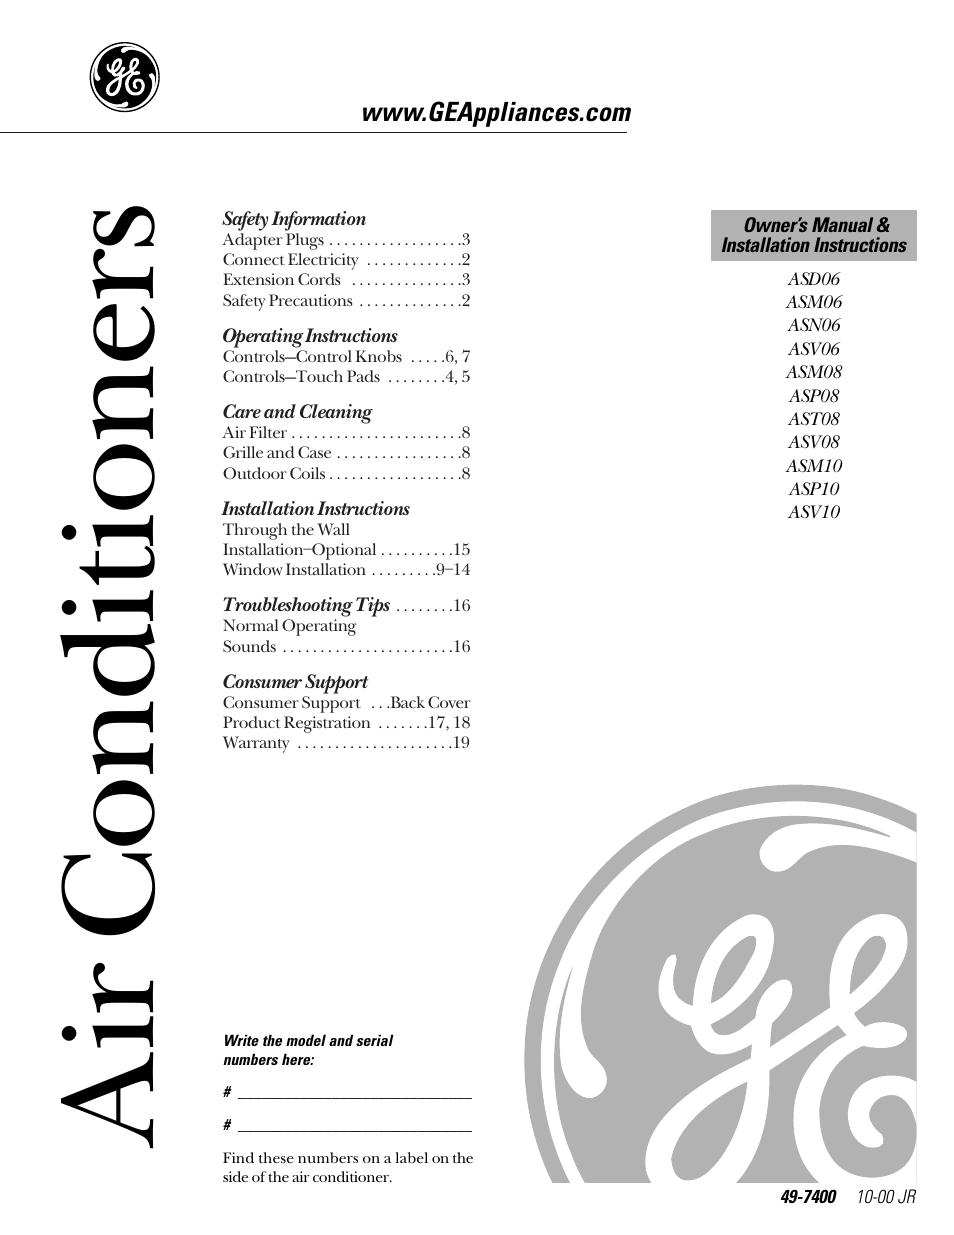 ge 49 7400 user manual 20 pages rh manualsdir com GE Refrigerator Manual GE Monogram Refrigerator